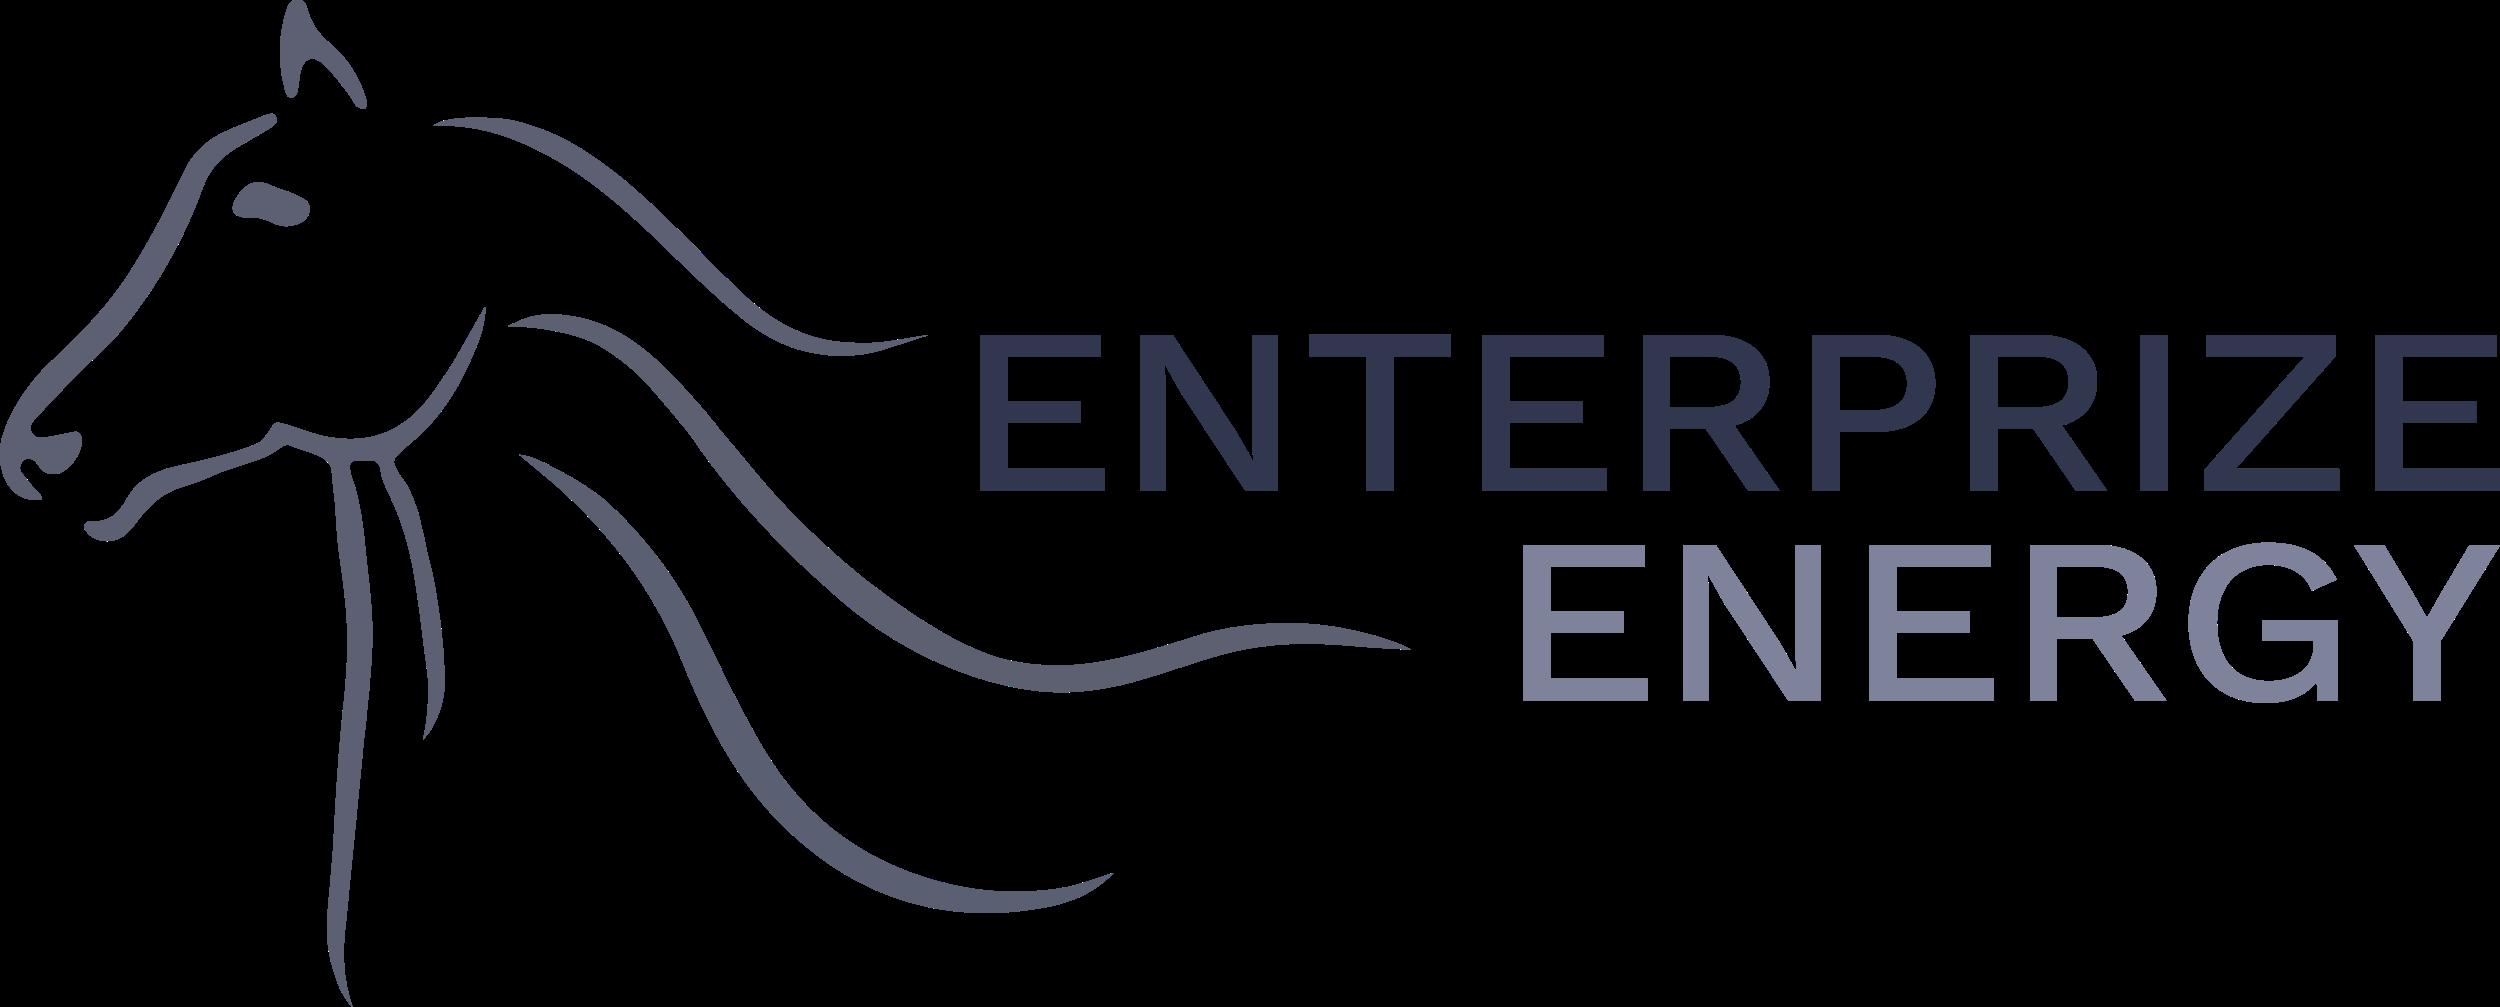 Enterprize Energy